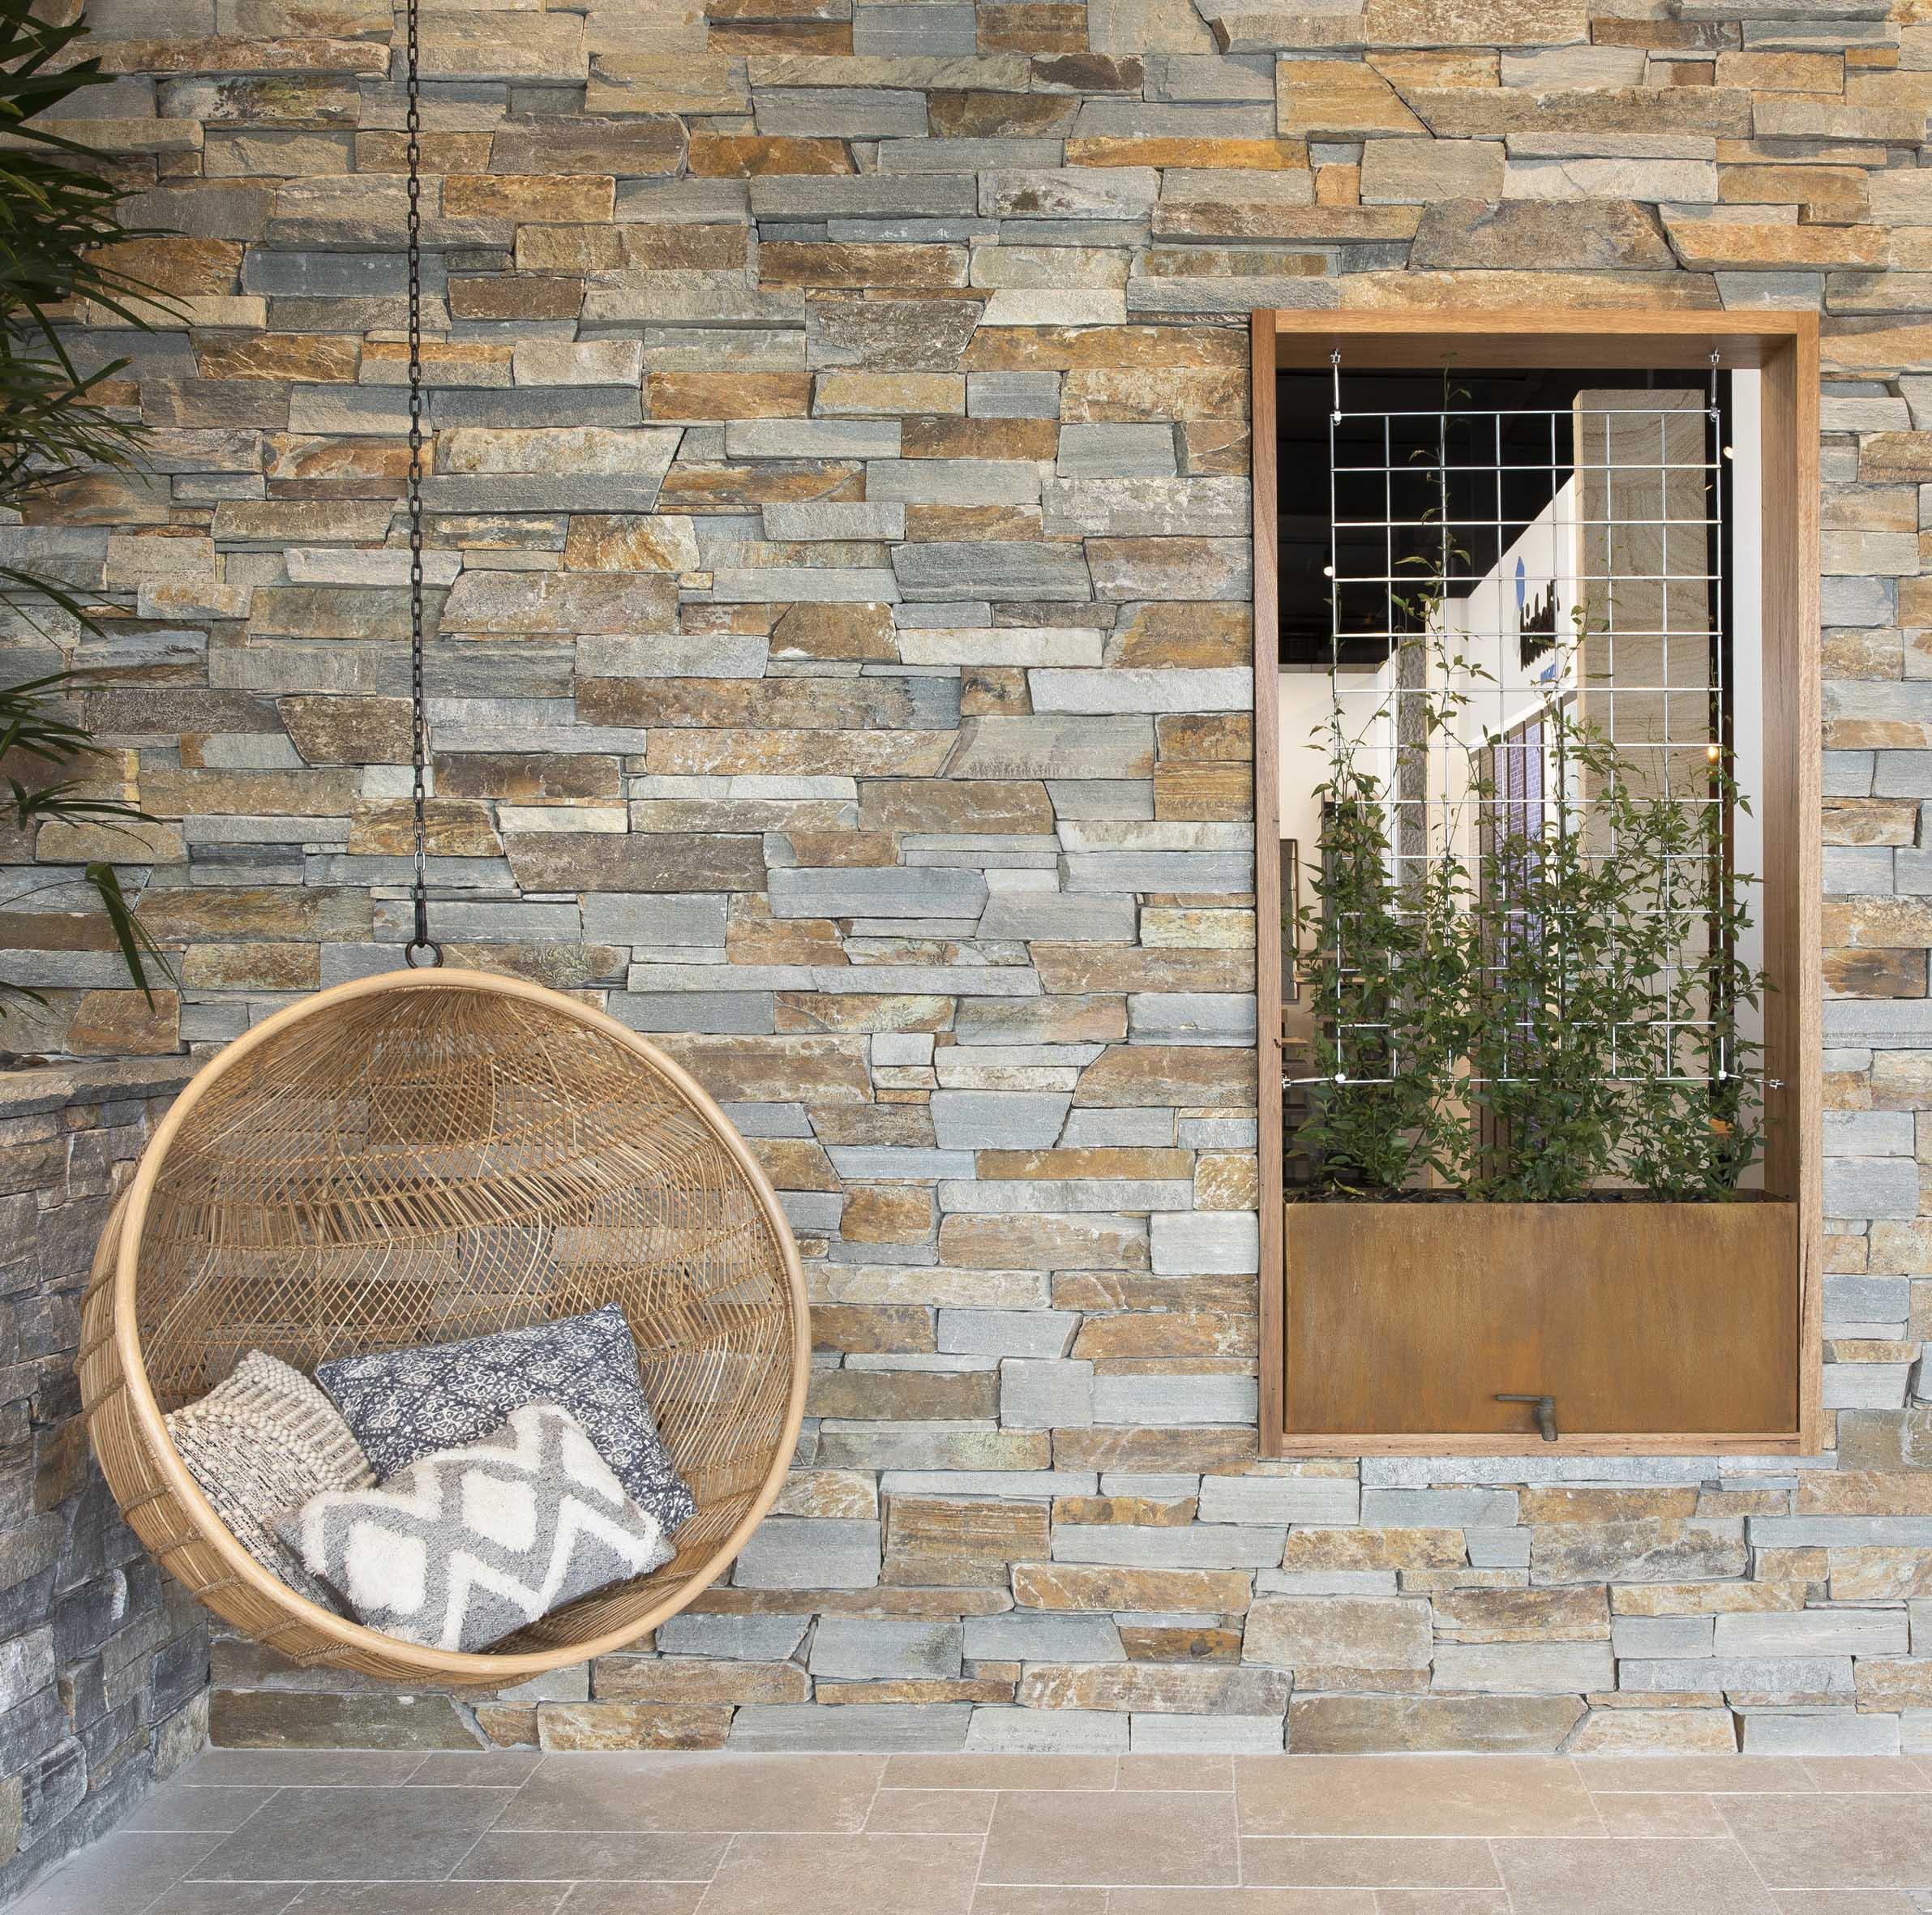 Blog hero-article-images natural-stone-wall-cladding